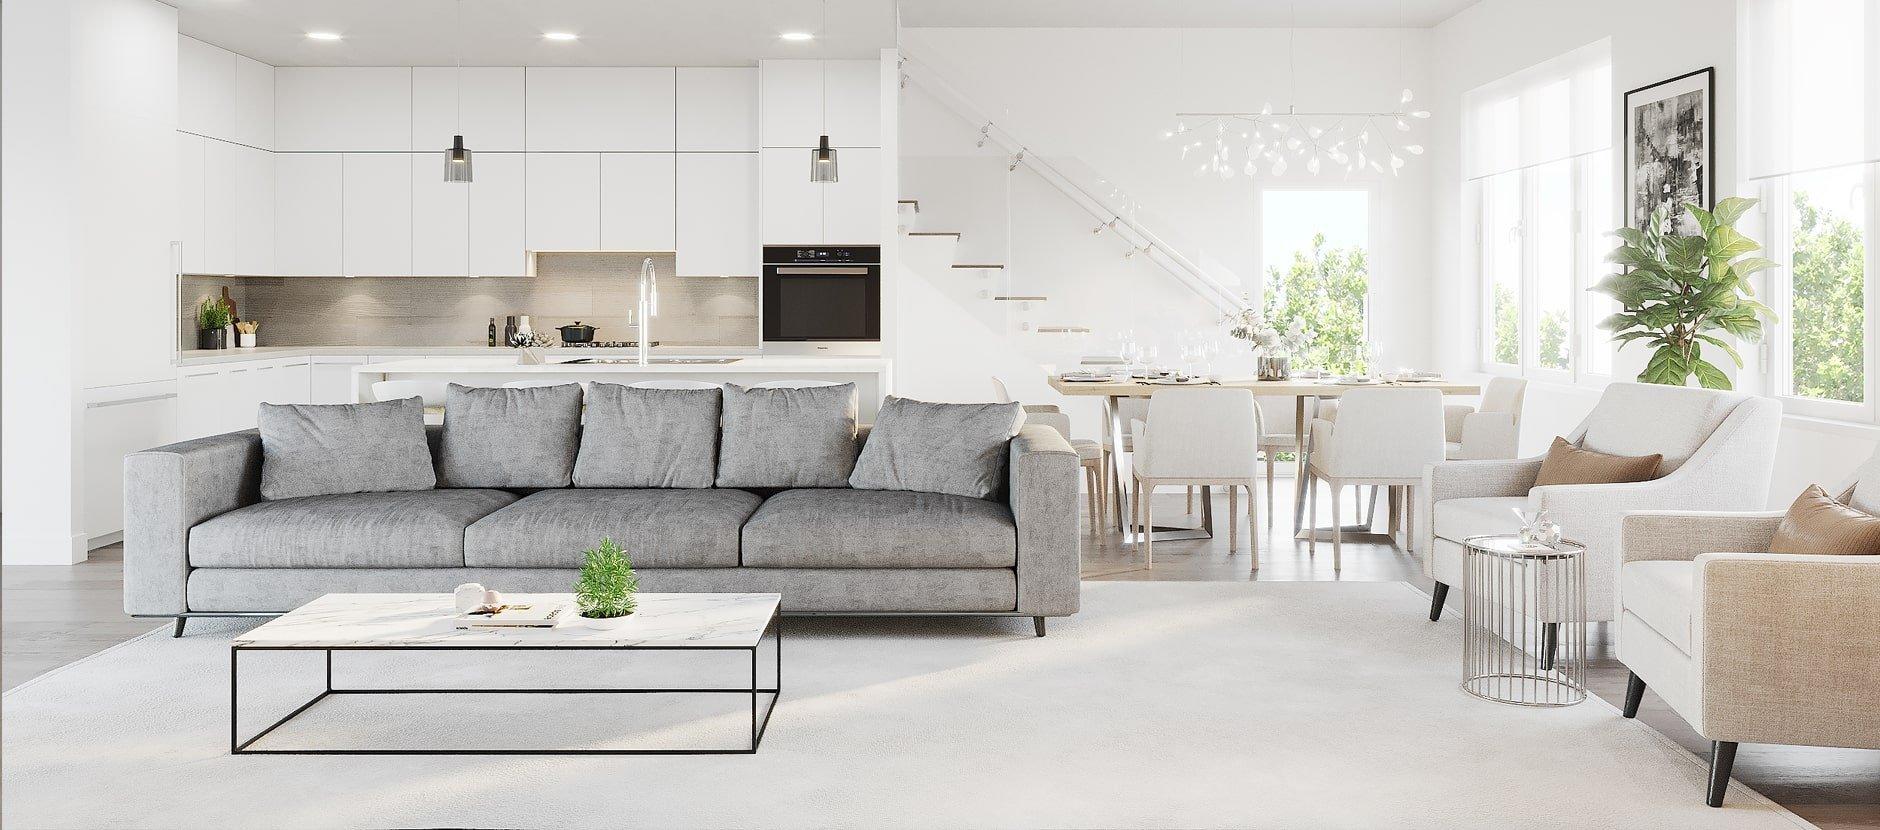 Living Area - 3095 Crescentview Dr, North Vancouver, BC V7R 2V2, Canada!